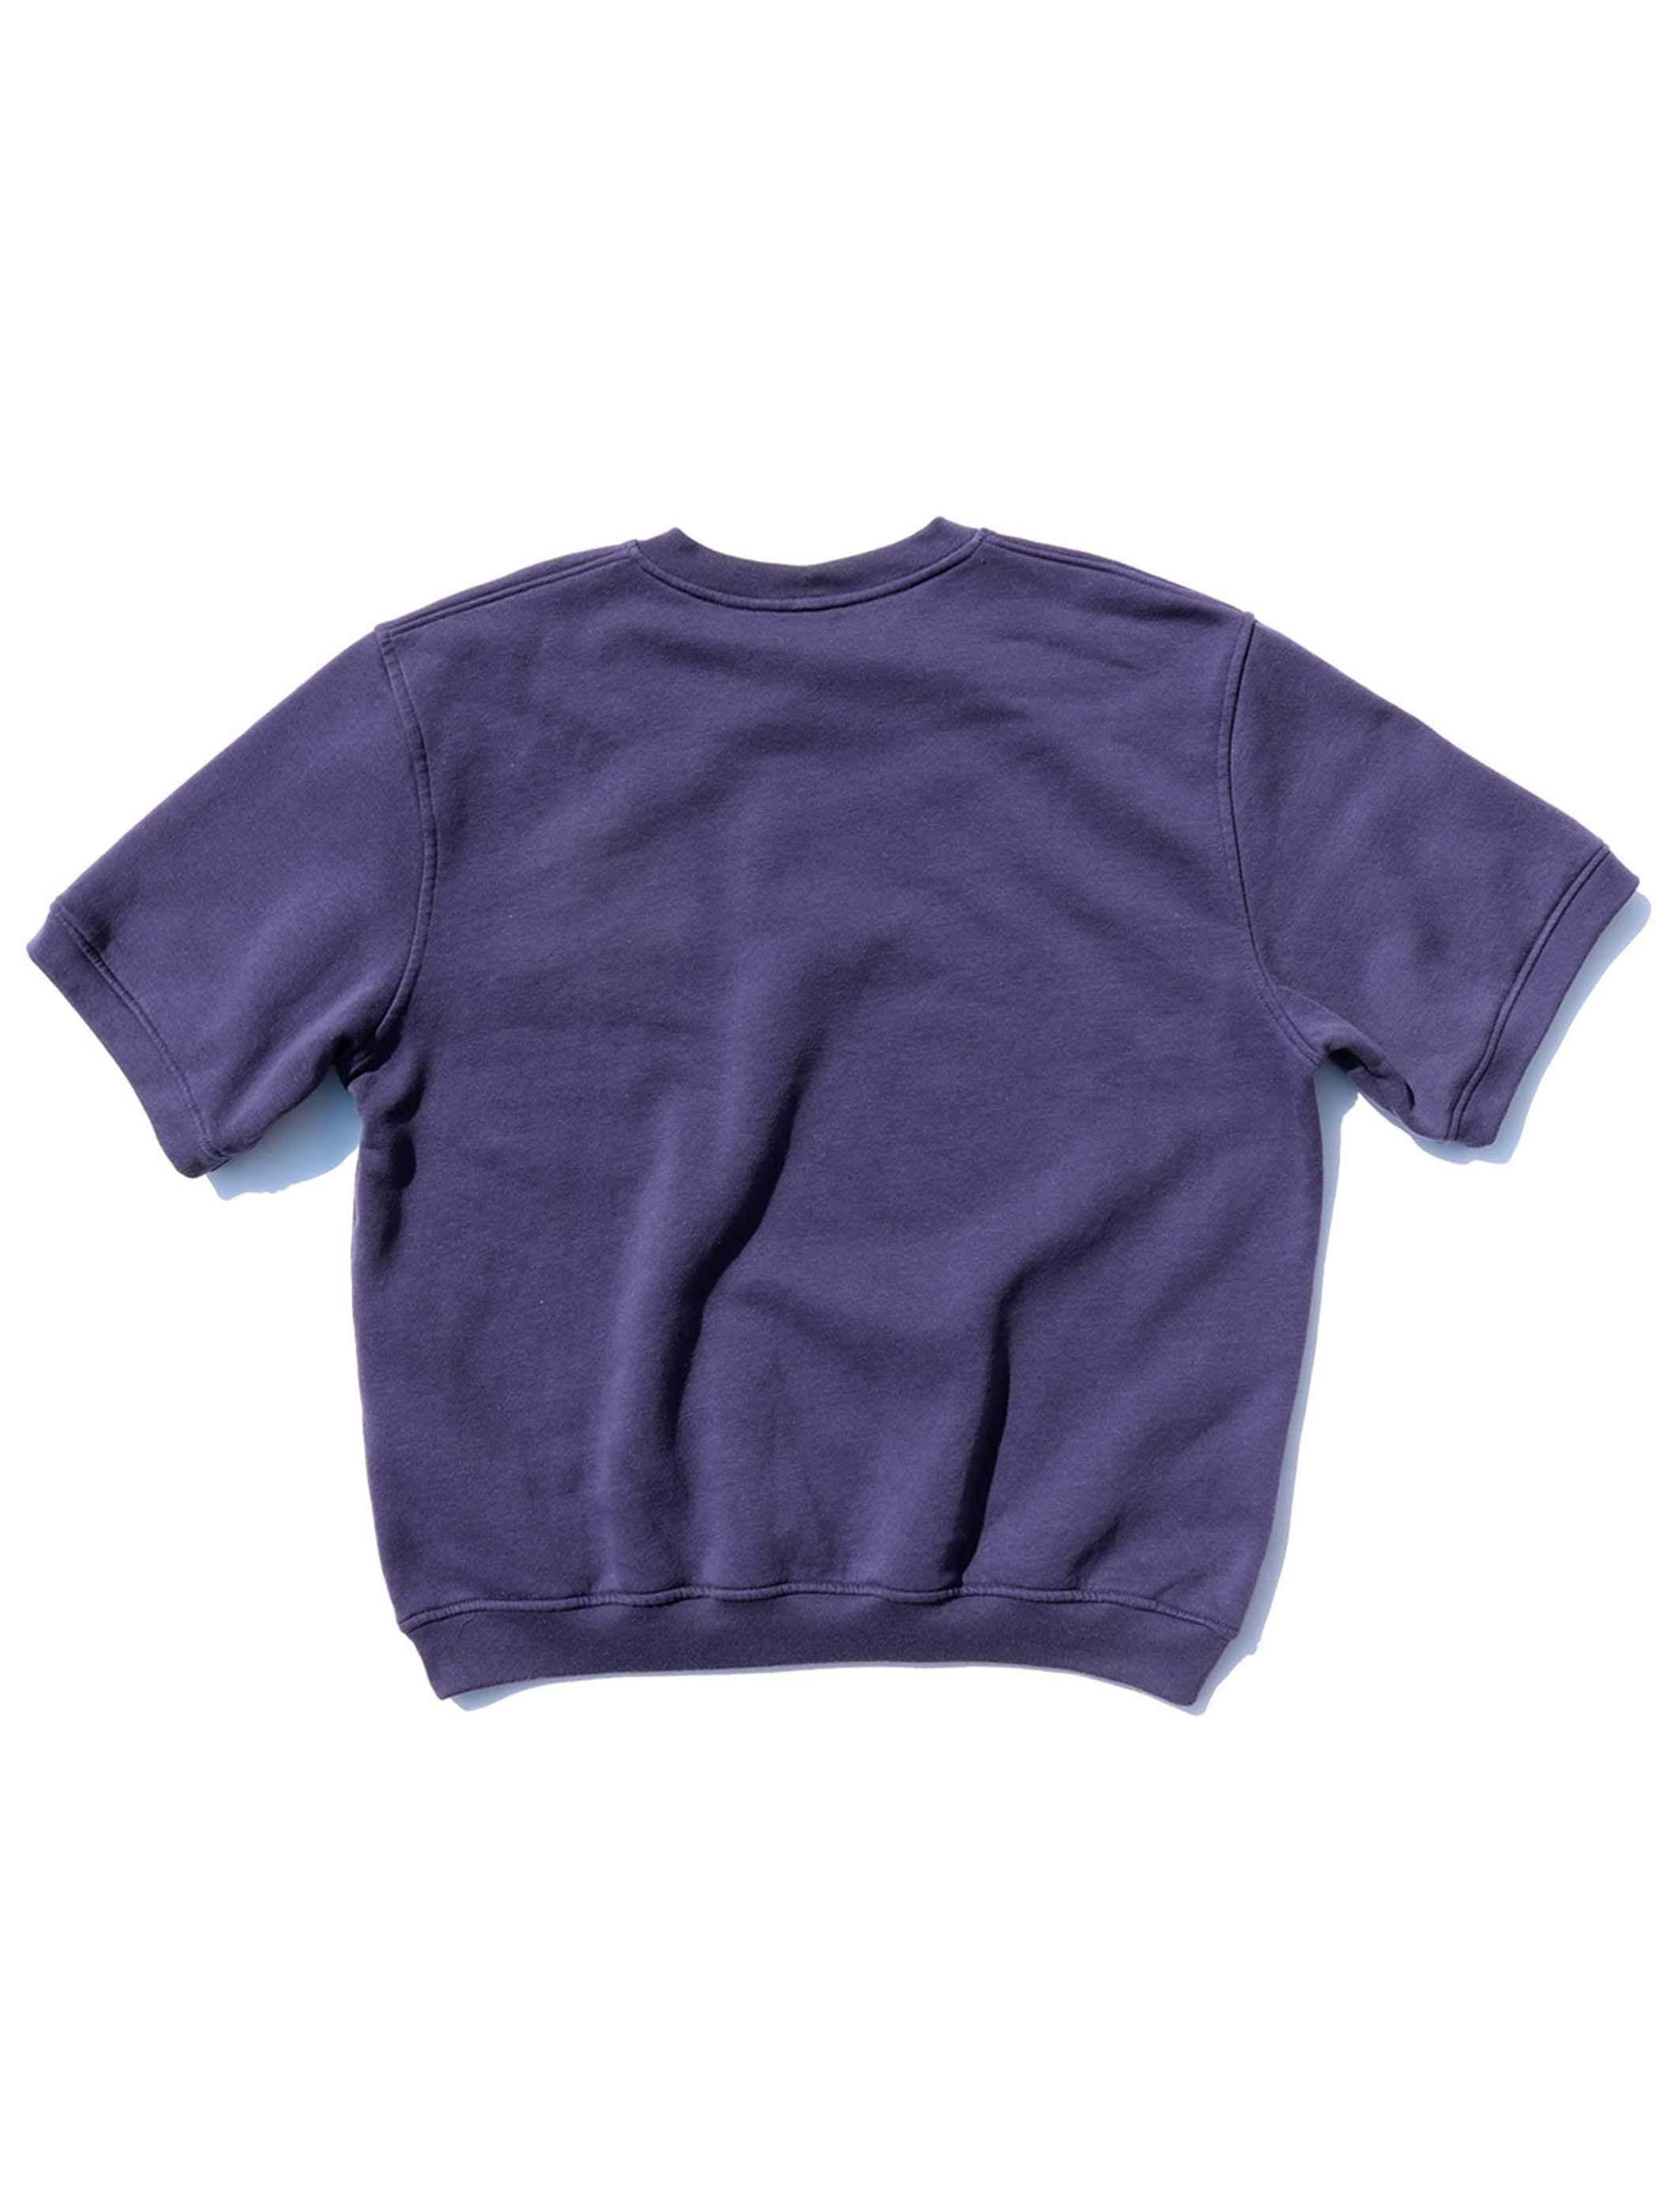 90's JOHN BLAIR ショートスリーブ ポケットスウェット [XL]